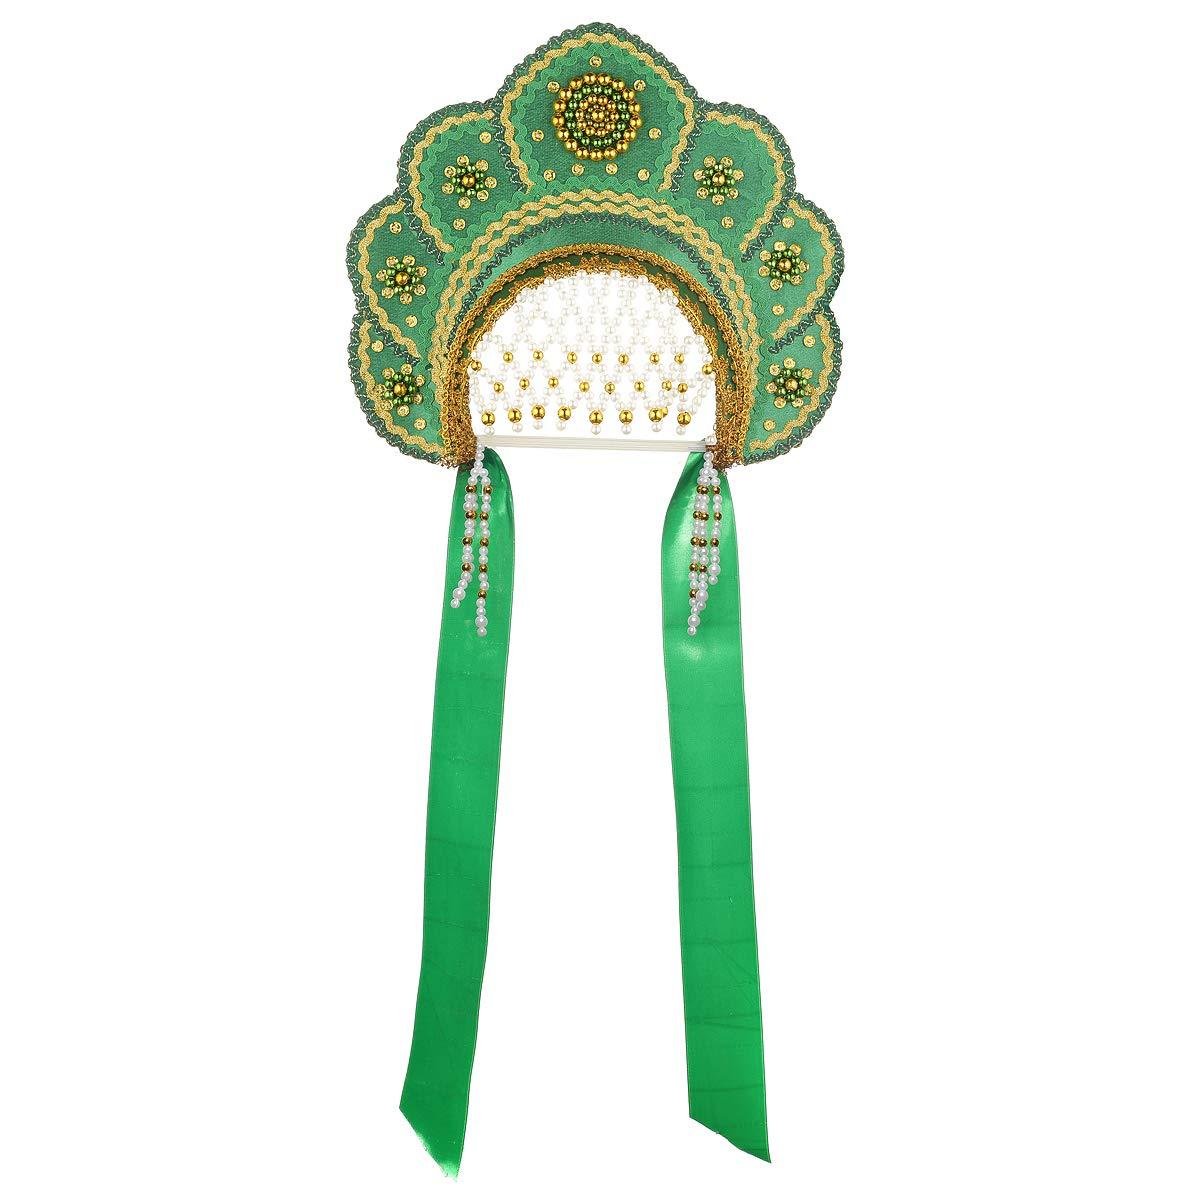 Russian Traditional Folk Costume Headdress Kokoshnik''Elena'' Green #288 by danila-souvenirs